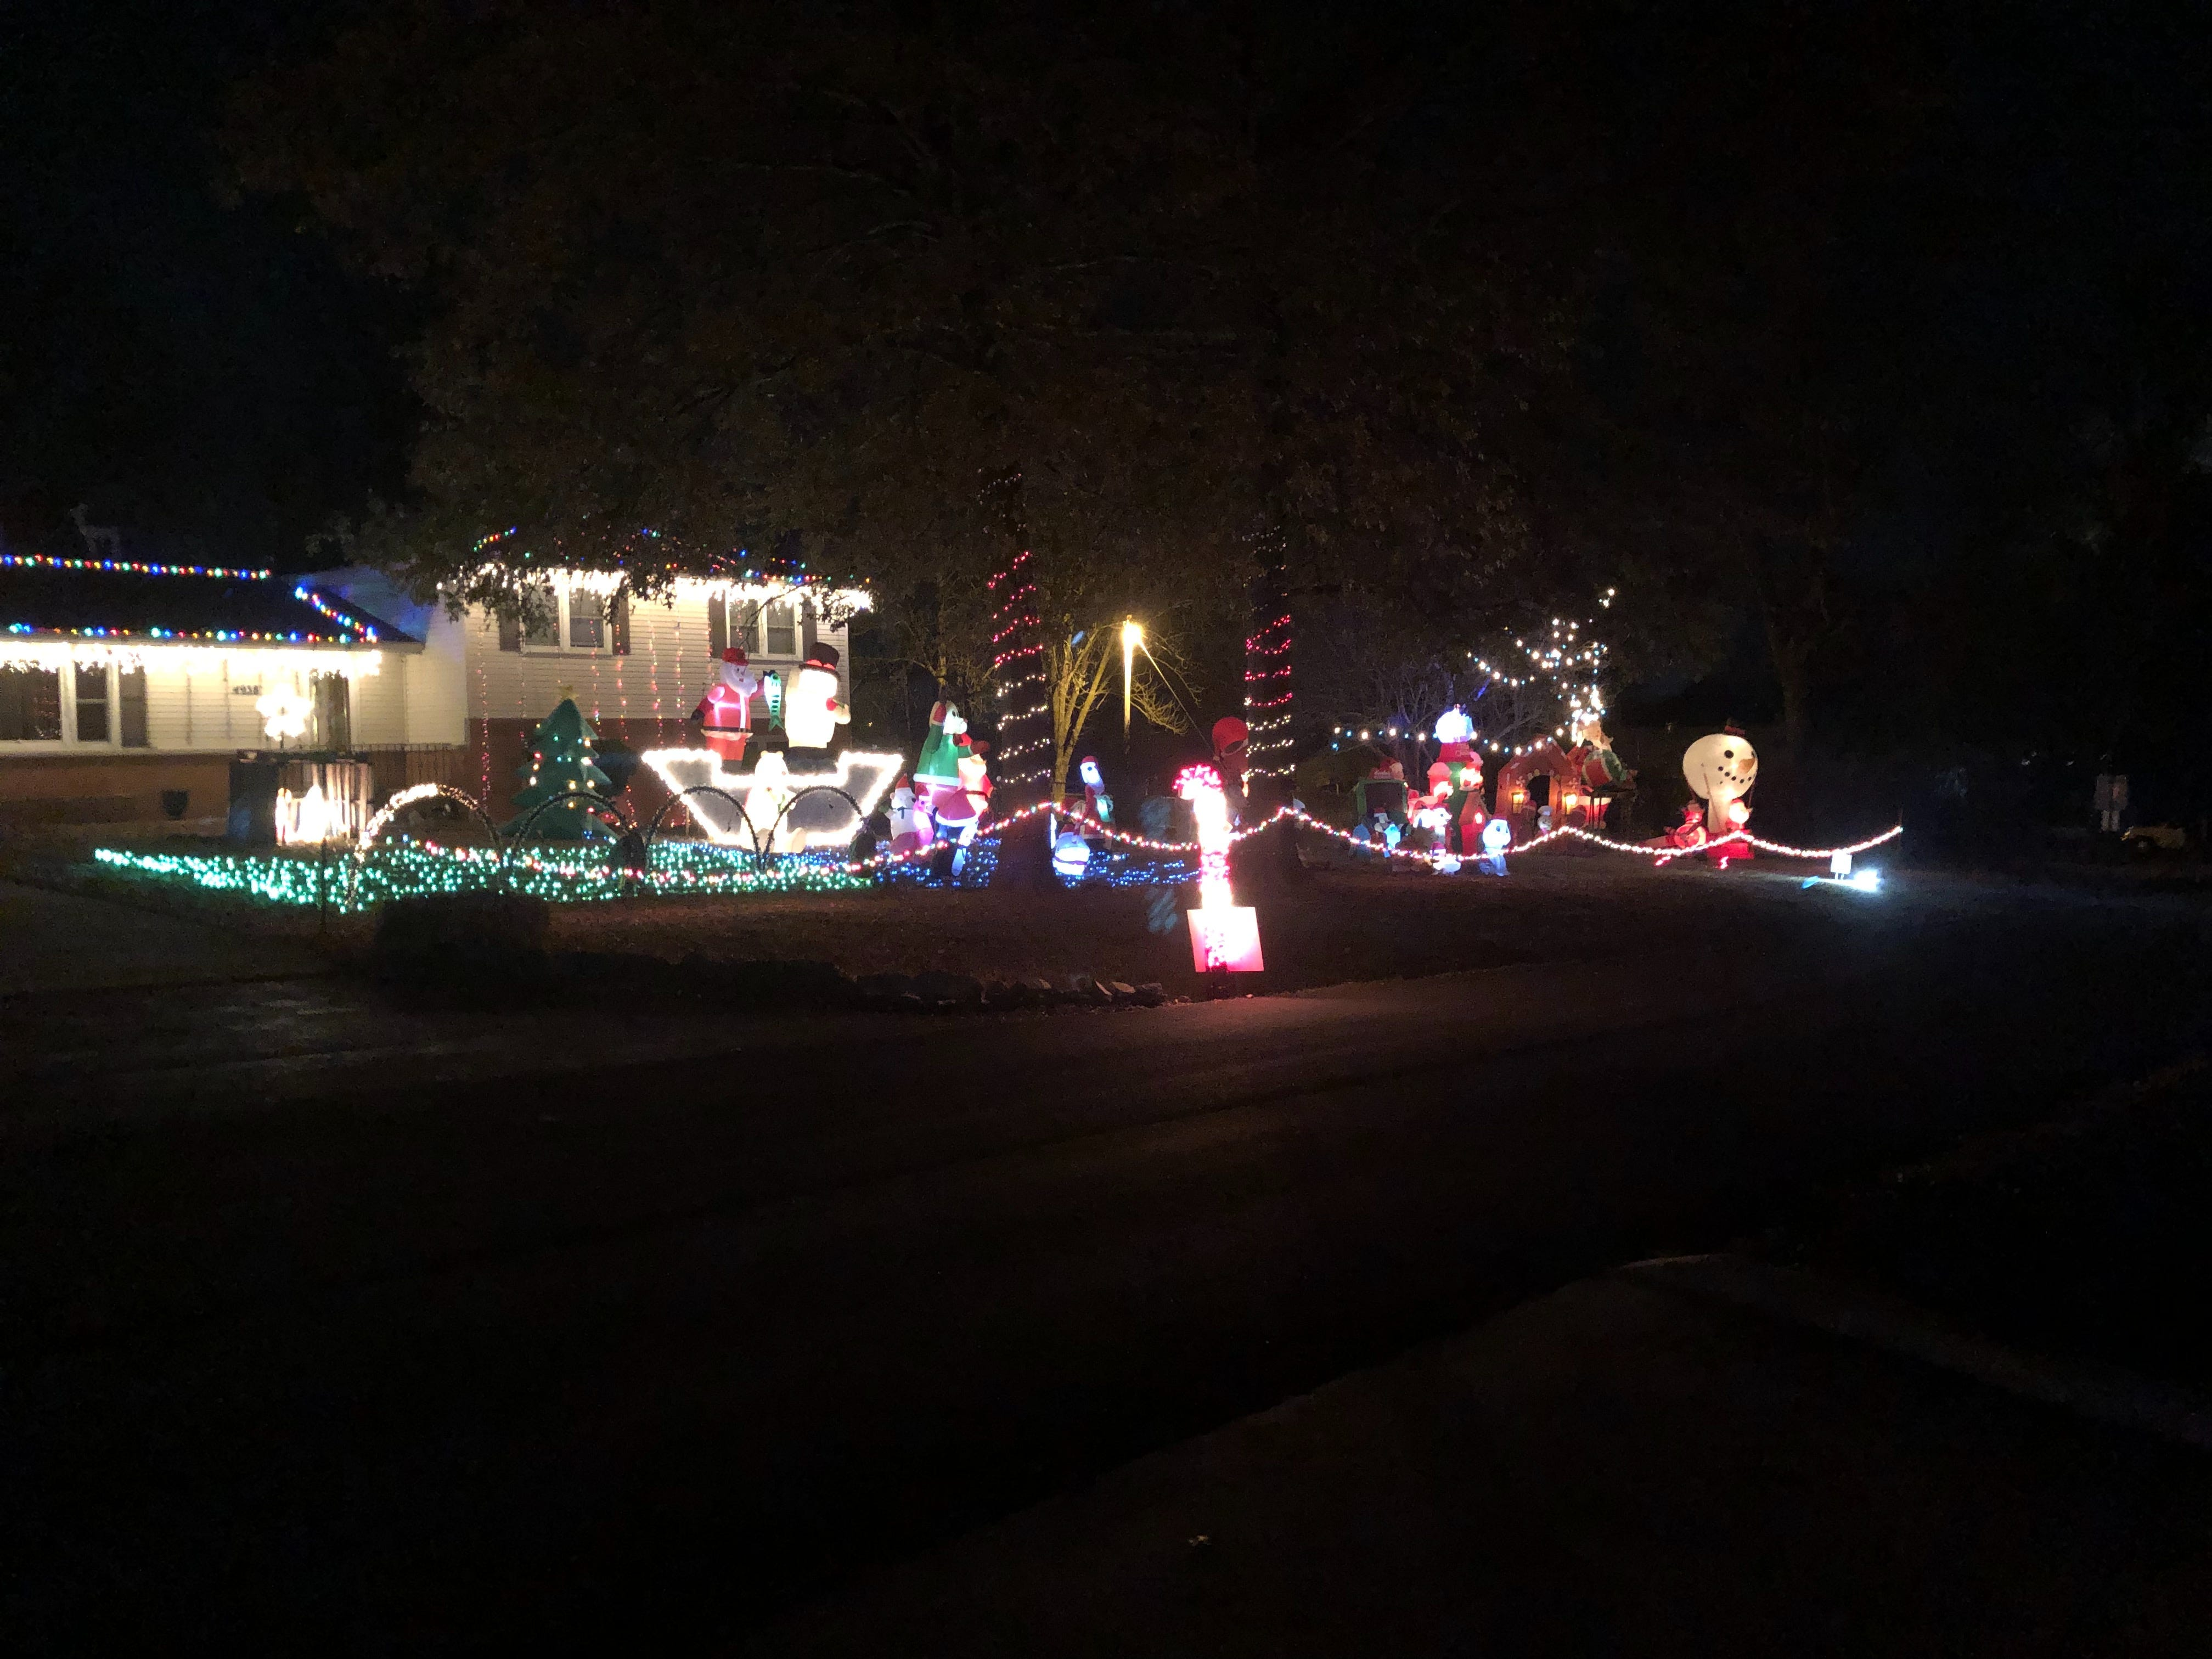 Jaxon Baker, 4938 S. Tujunga Drive, Springfield